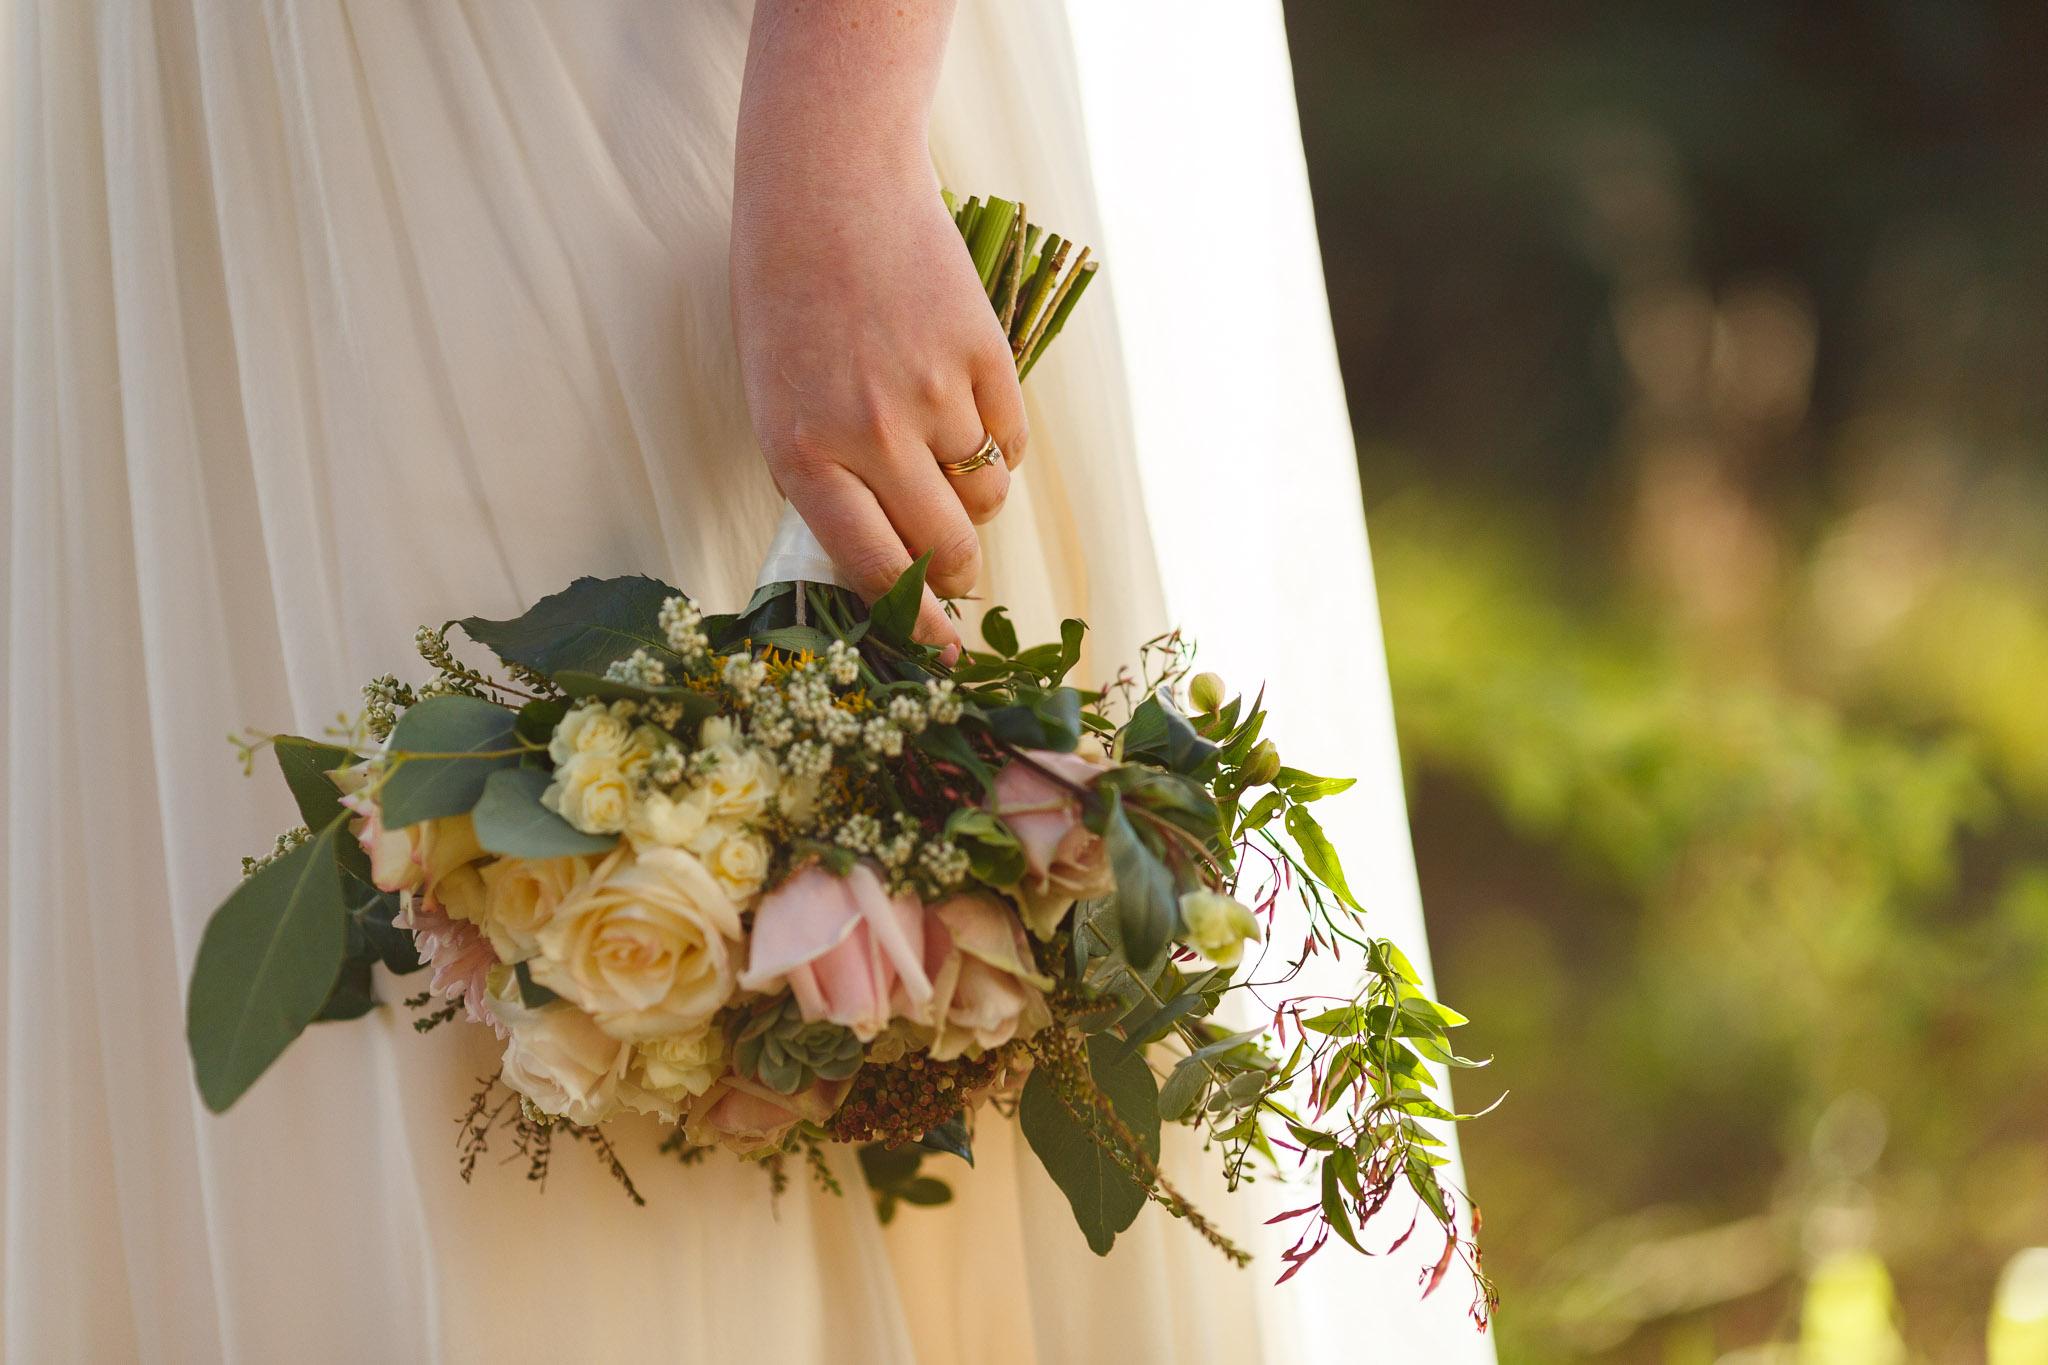 highlight_wedding_photography_manawatu_palmerston_north_new_zealand_rangitikei_golf_ohakea-55.jpg